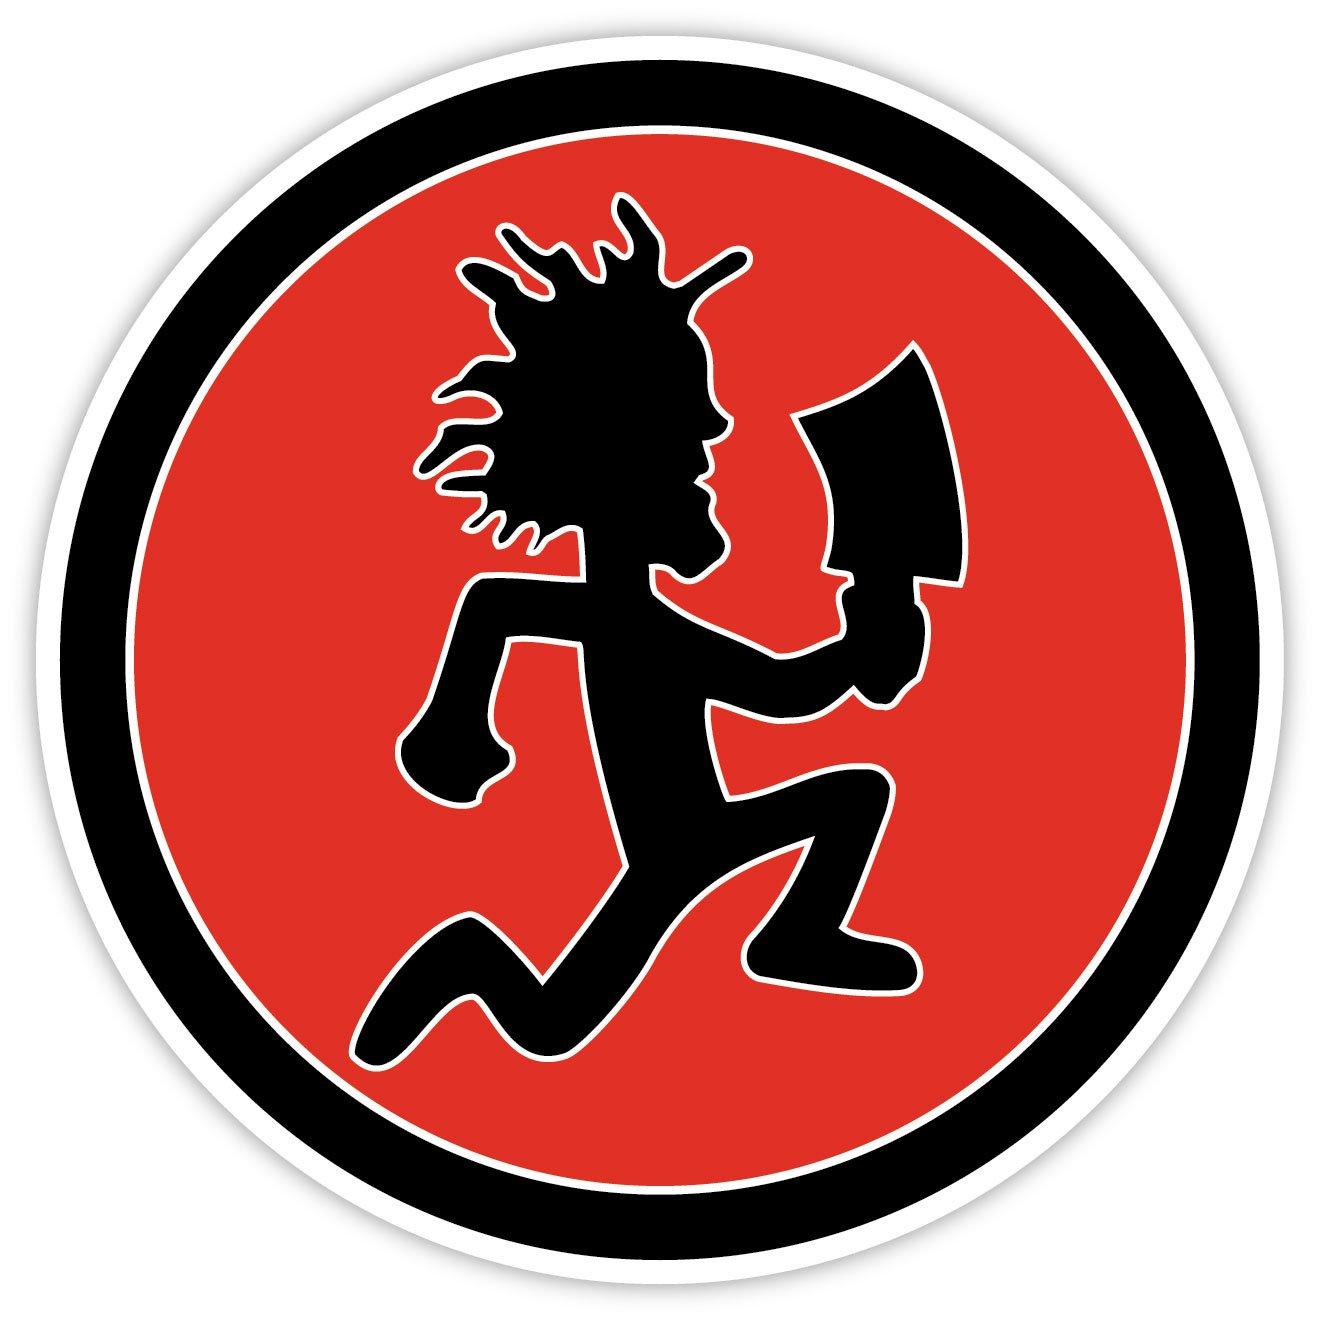 Amazon Hatchetman Hatchet Man Psychopathic Axe Juggalo Vinyl